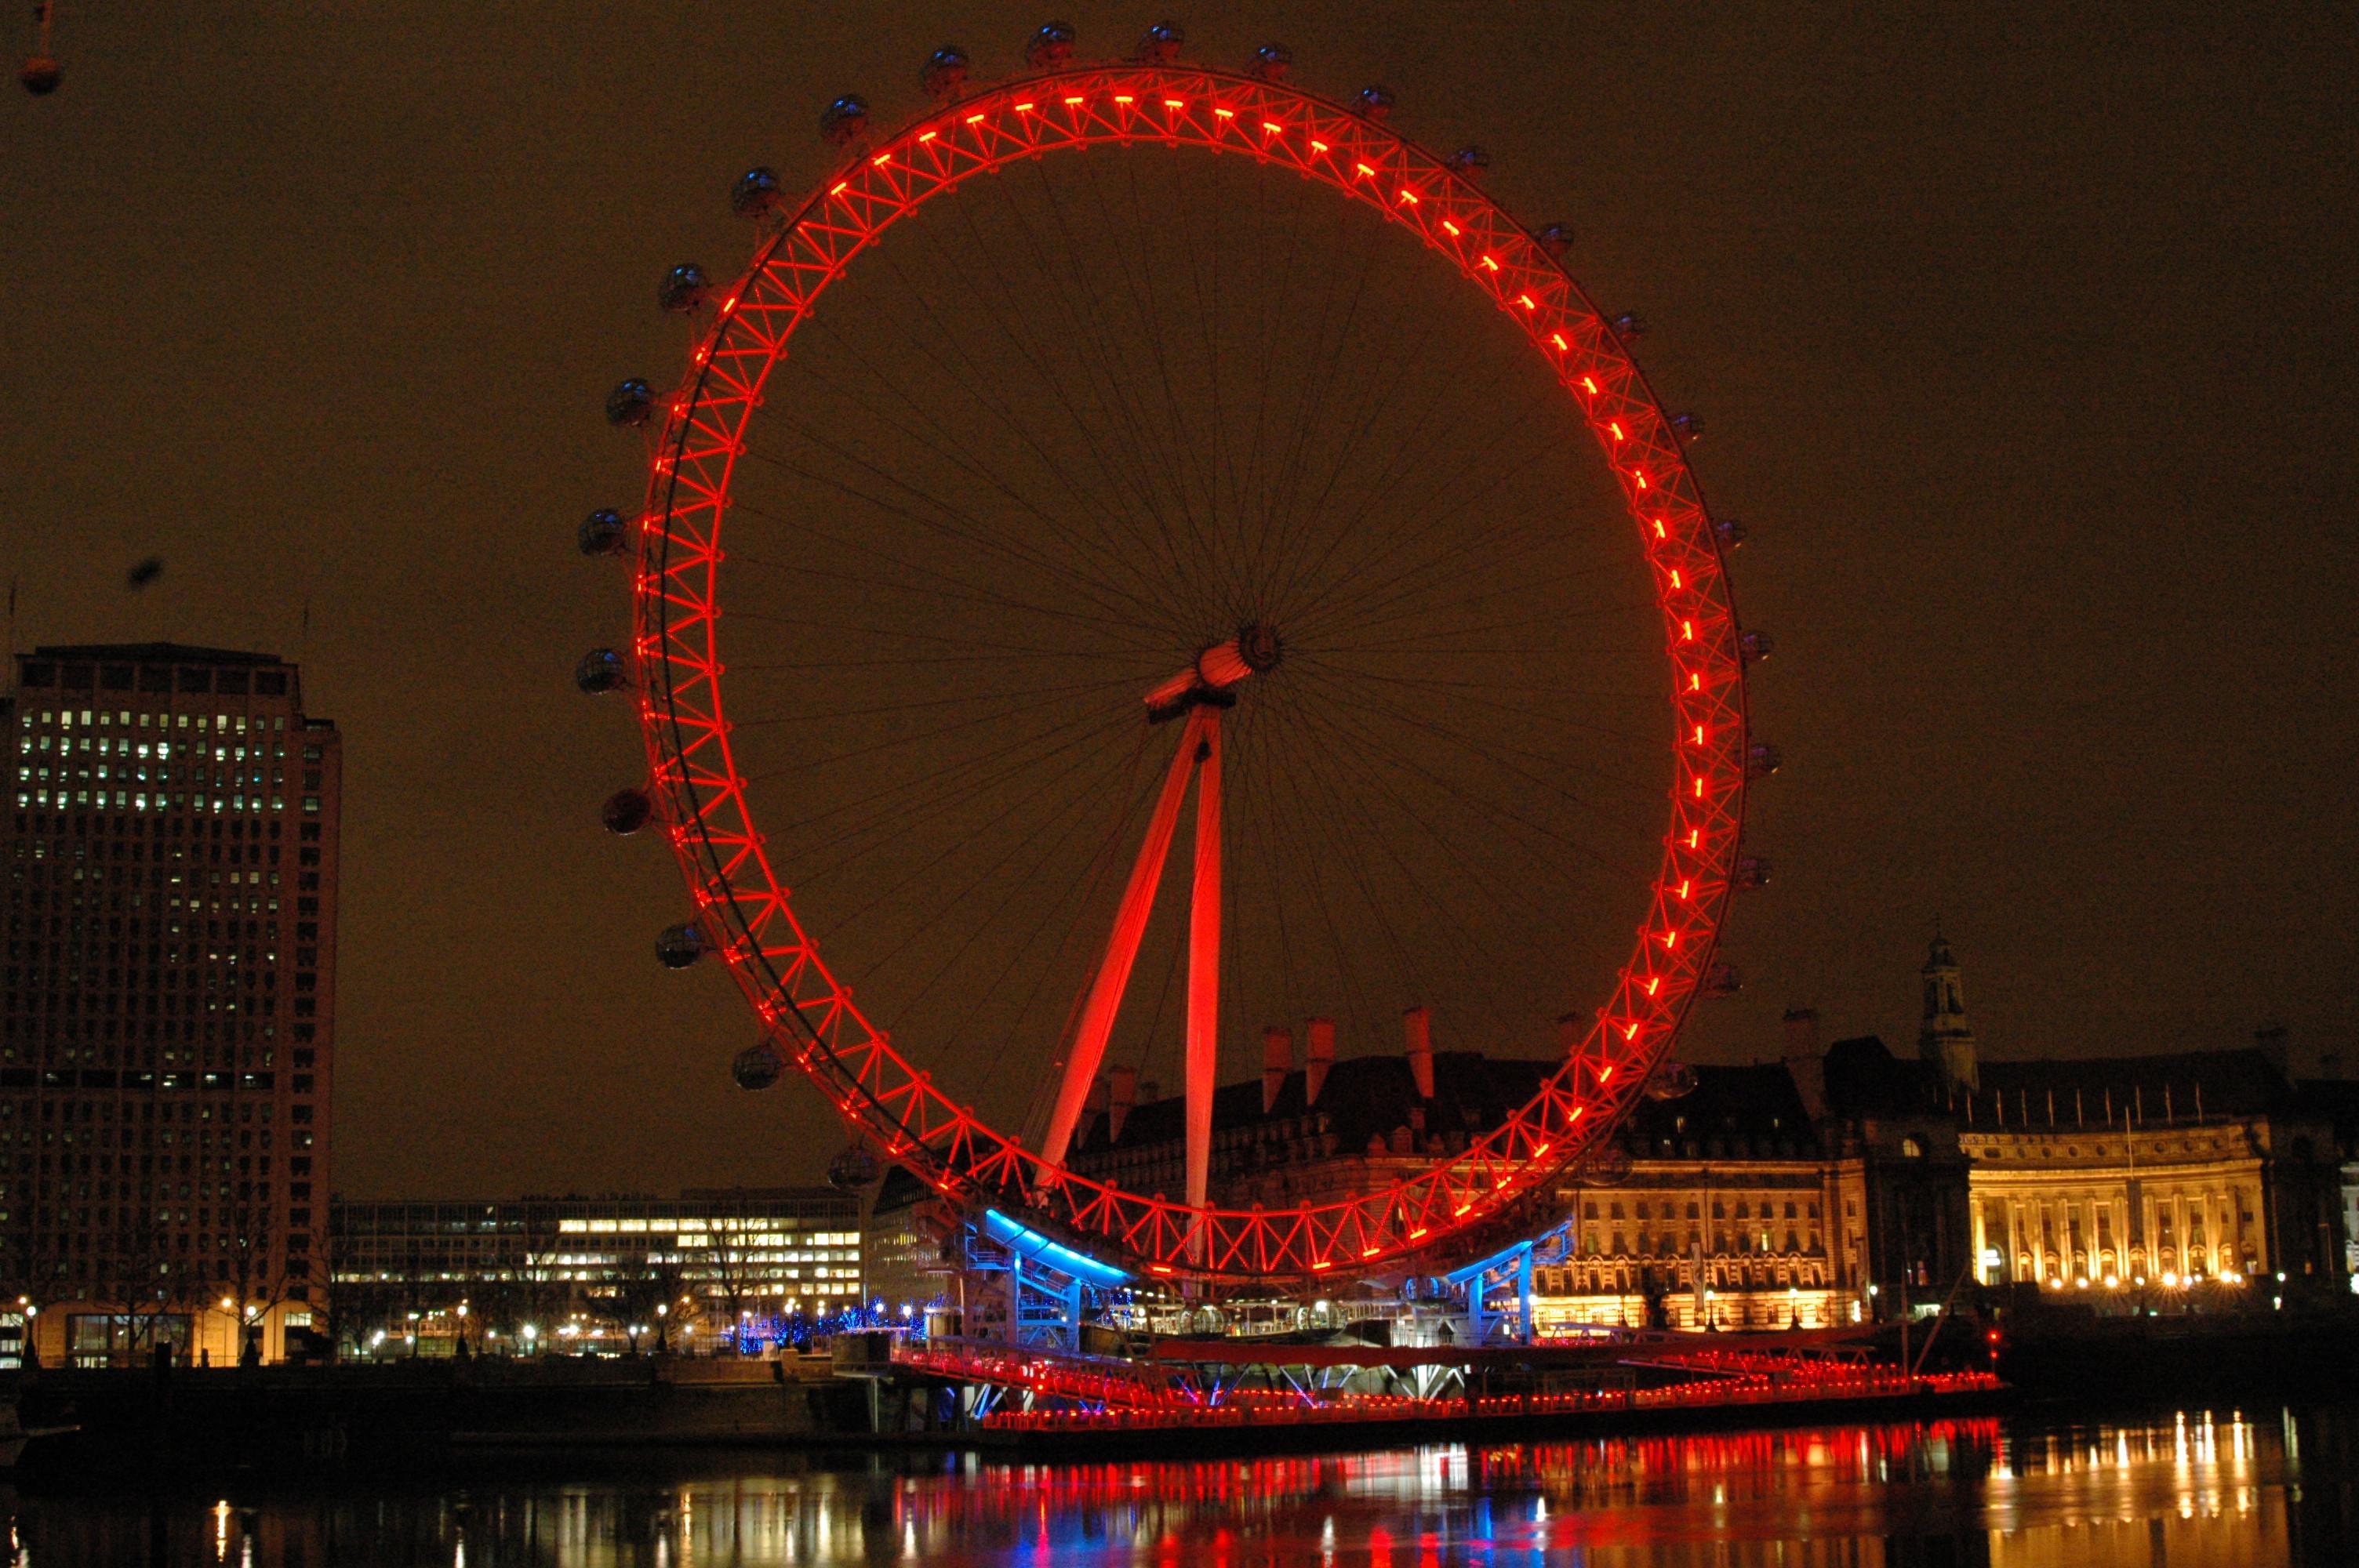 london eye by night - photo #8